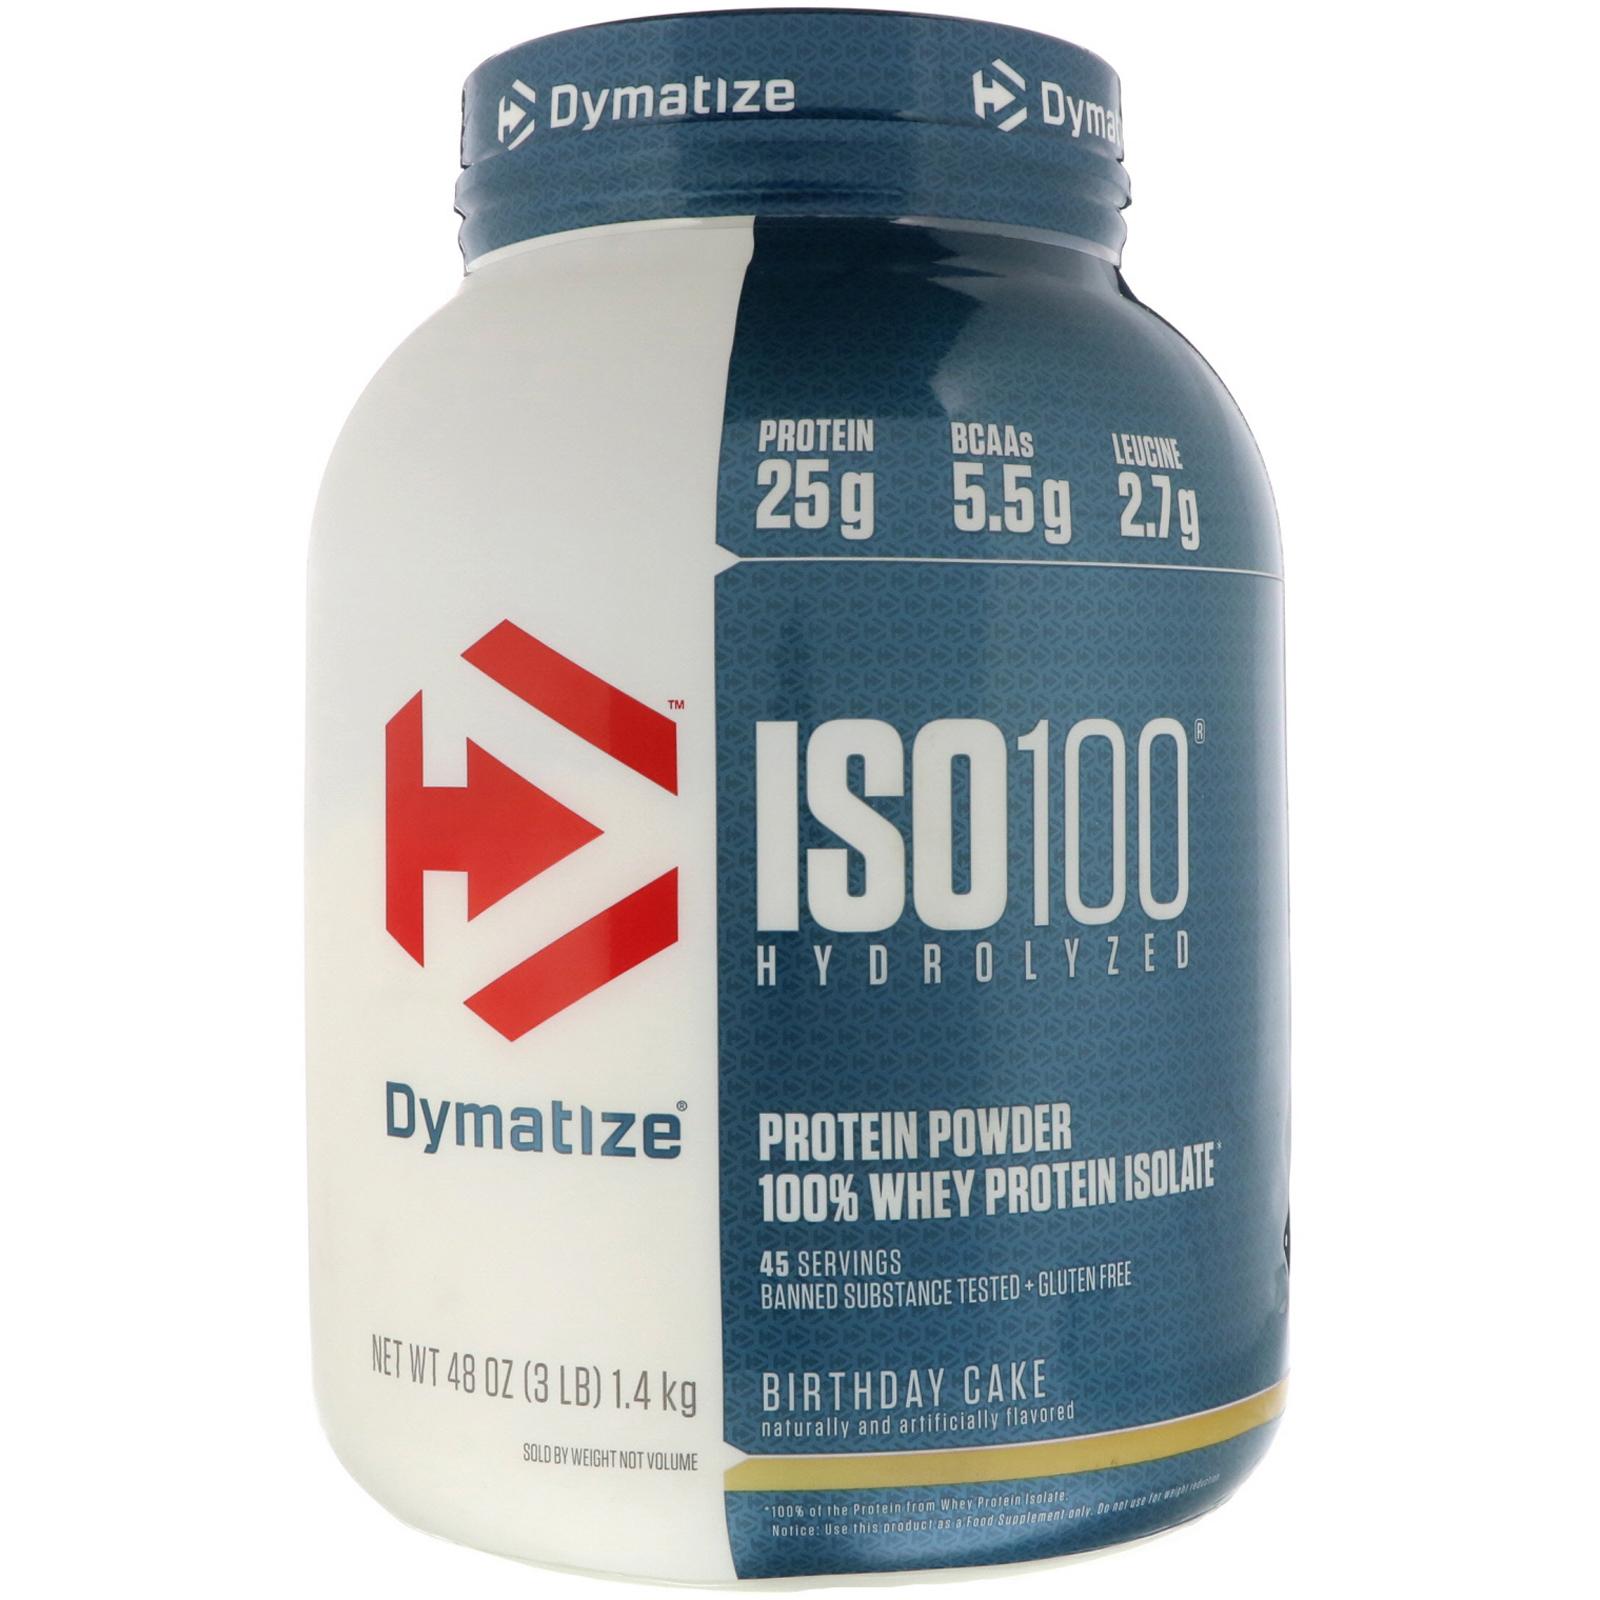 Dymatize Nutrition ISO 100 Hydrolyzed Whey Protein Isolate Birthday Cake 48 Oz 14 Kg